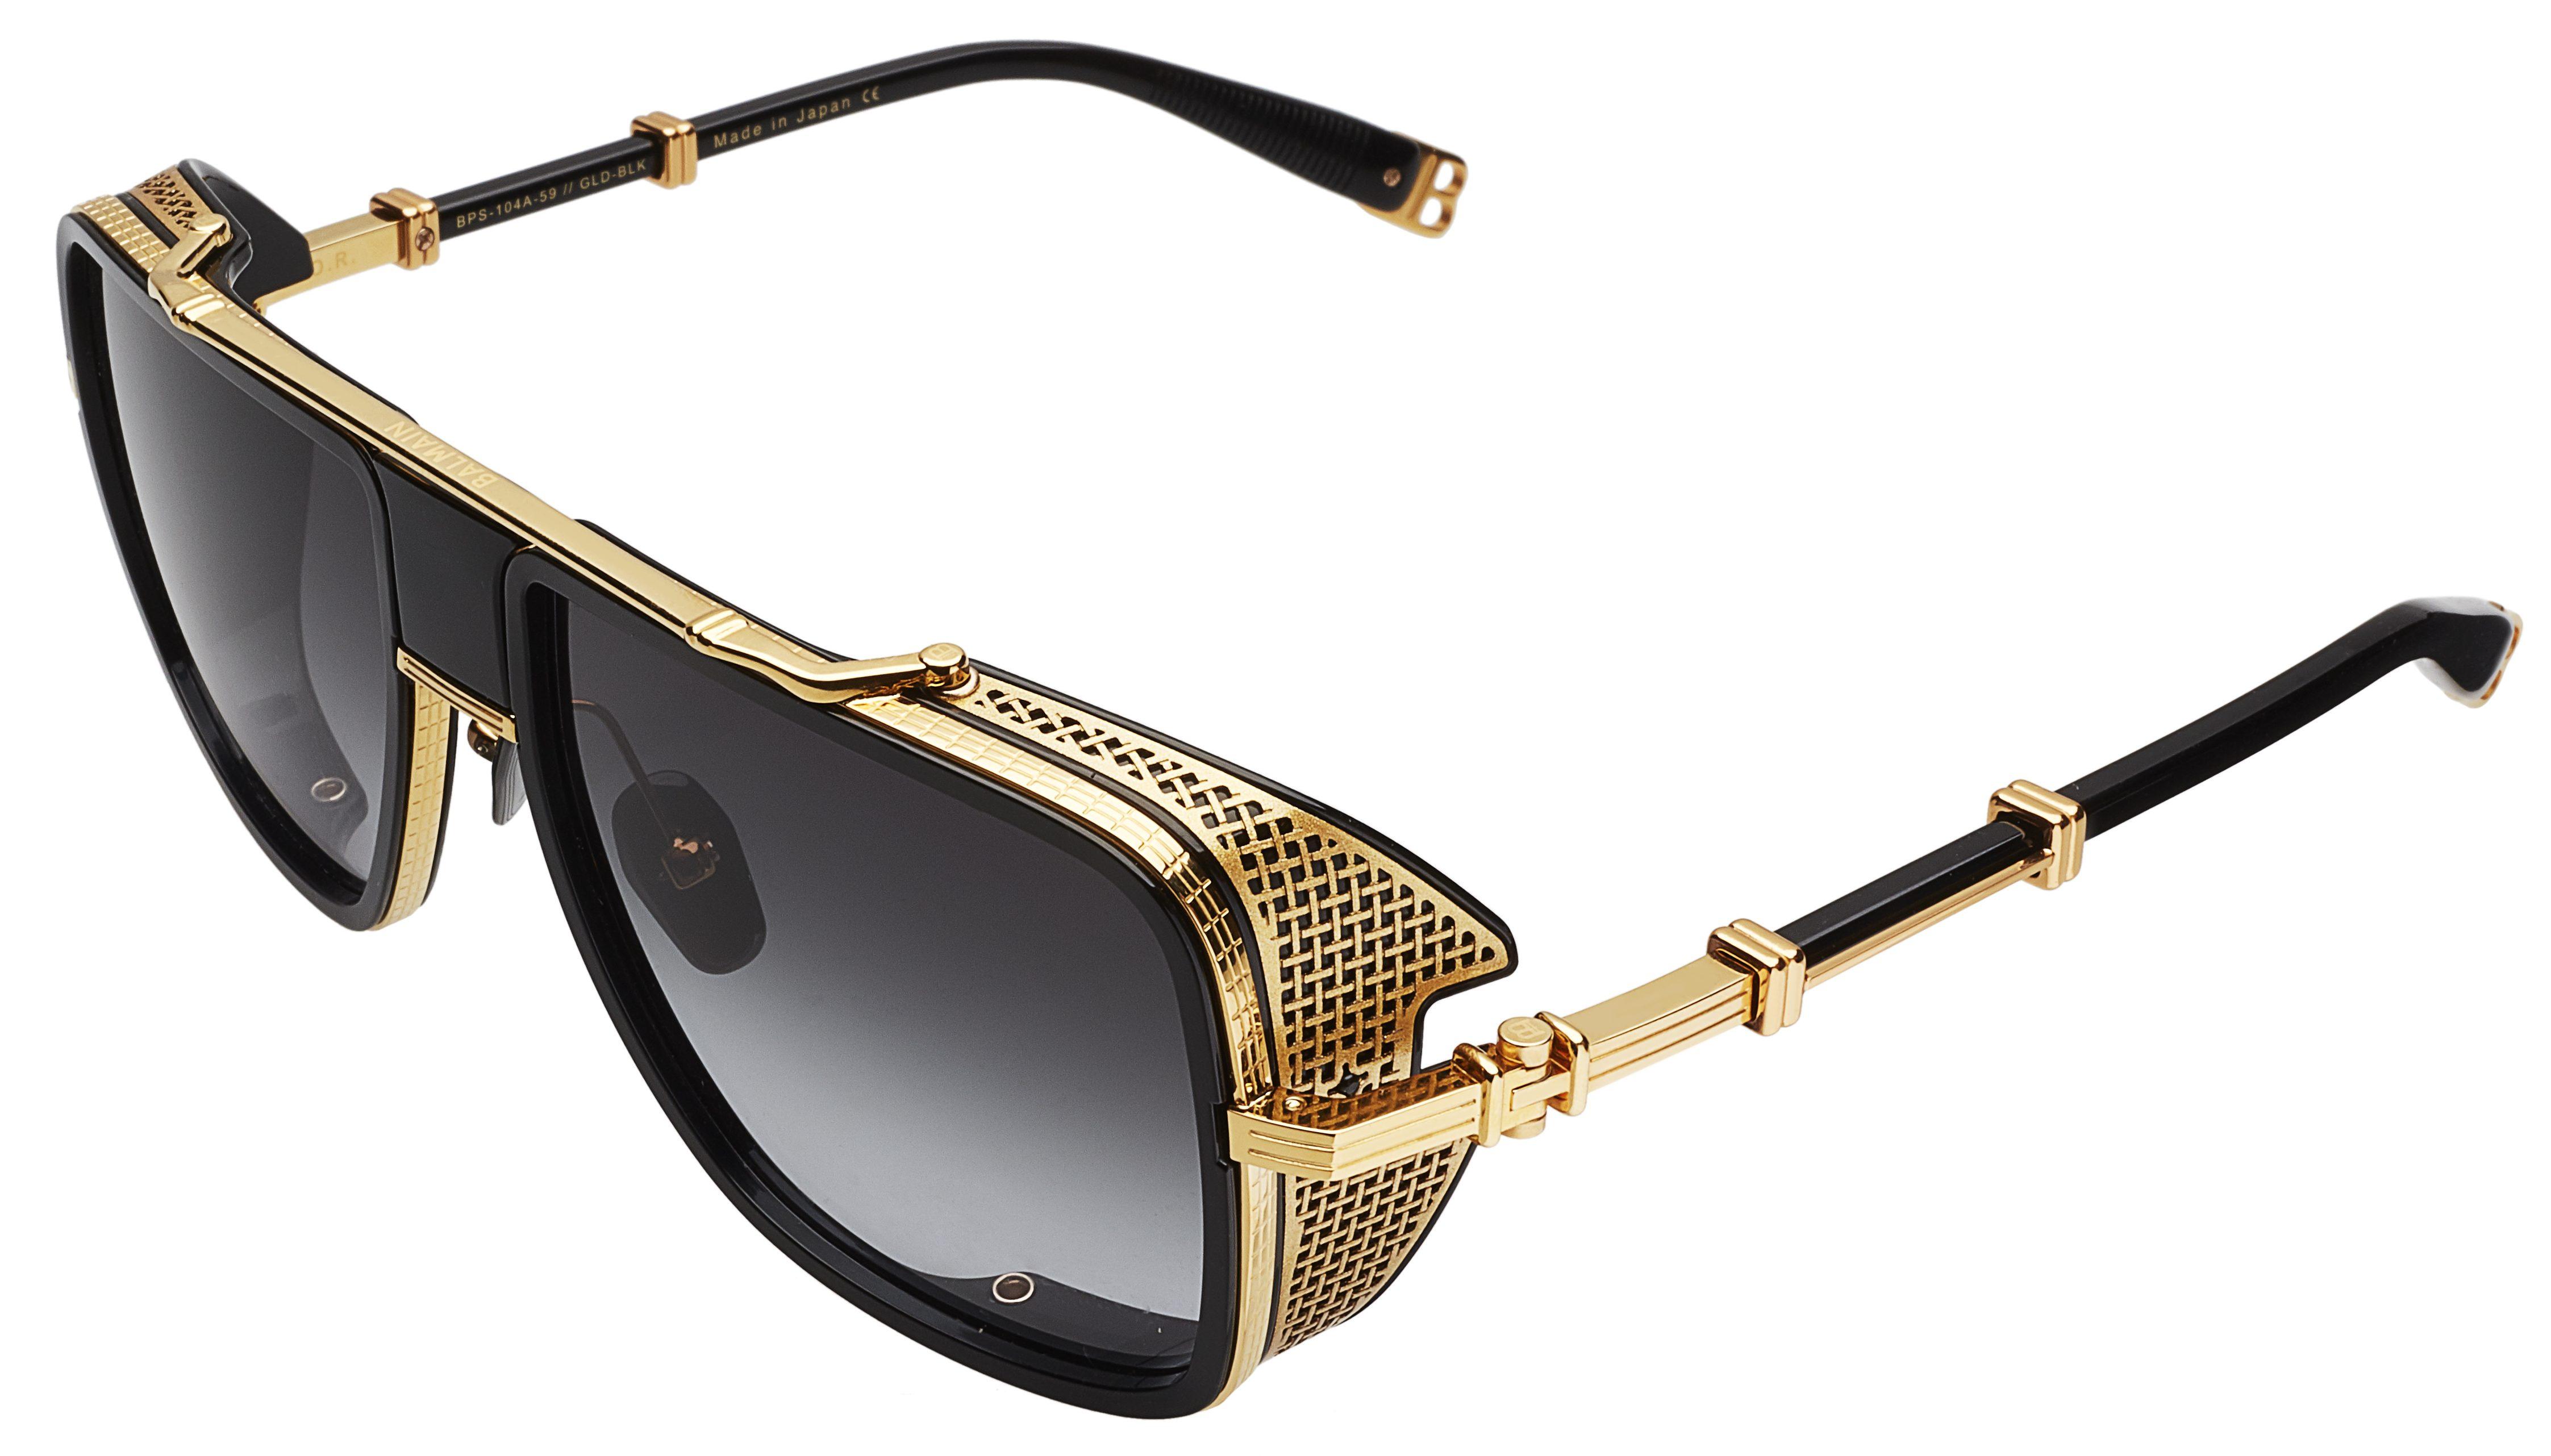 Balmain Debuts First Eyewear Collection With Akoni